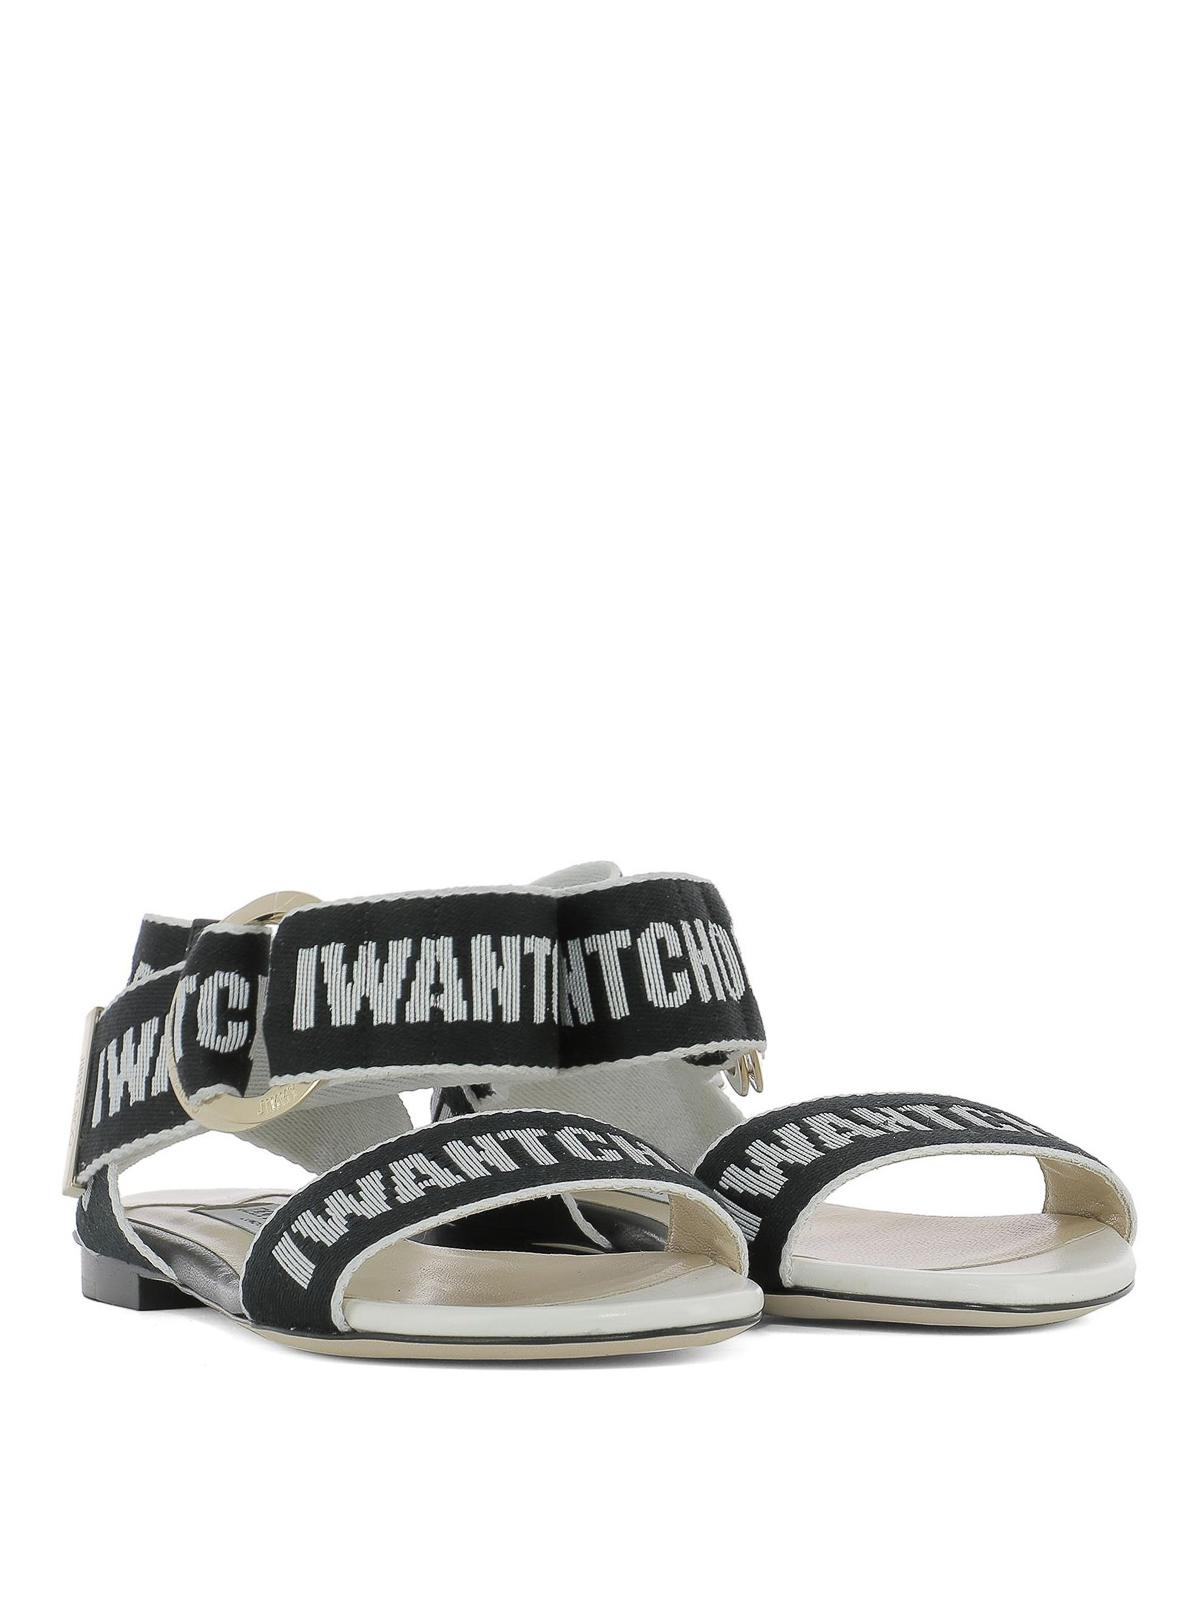 bb0a80e8b1a JIMMY CHOO  sandals online - Breanne black and chalk logo tape sandals